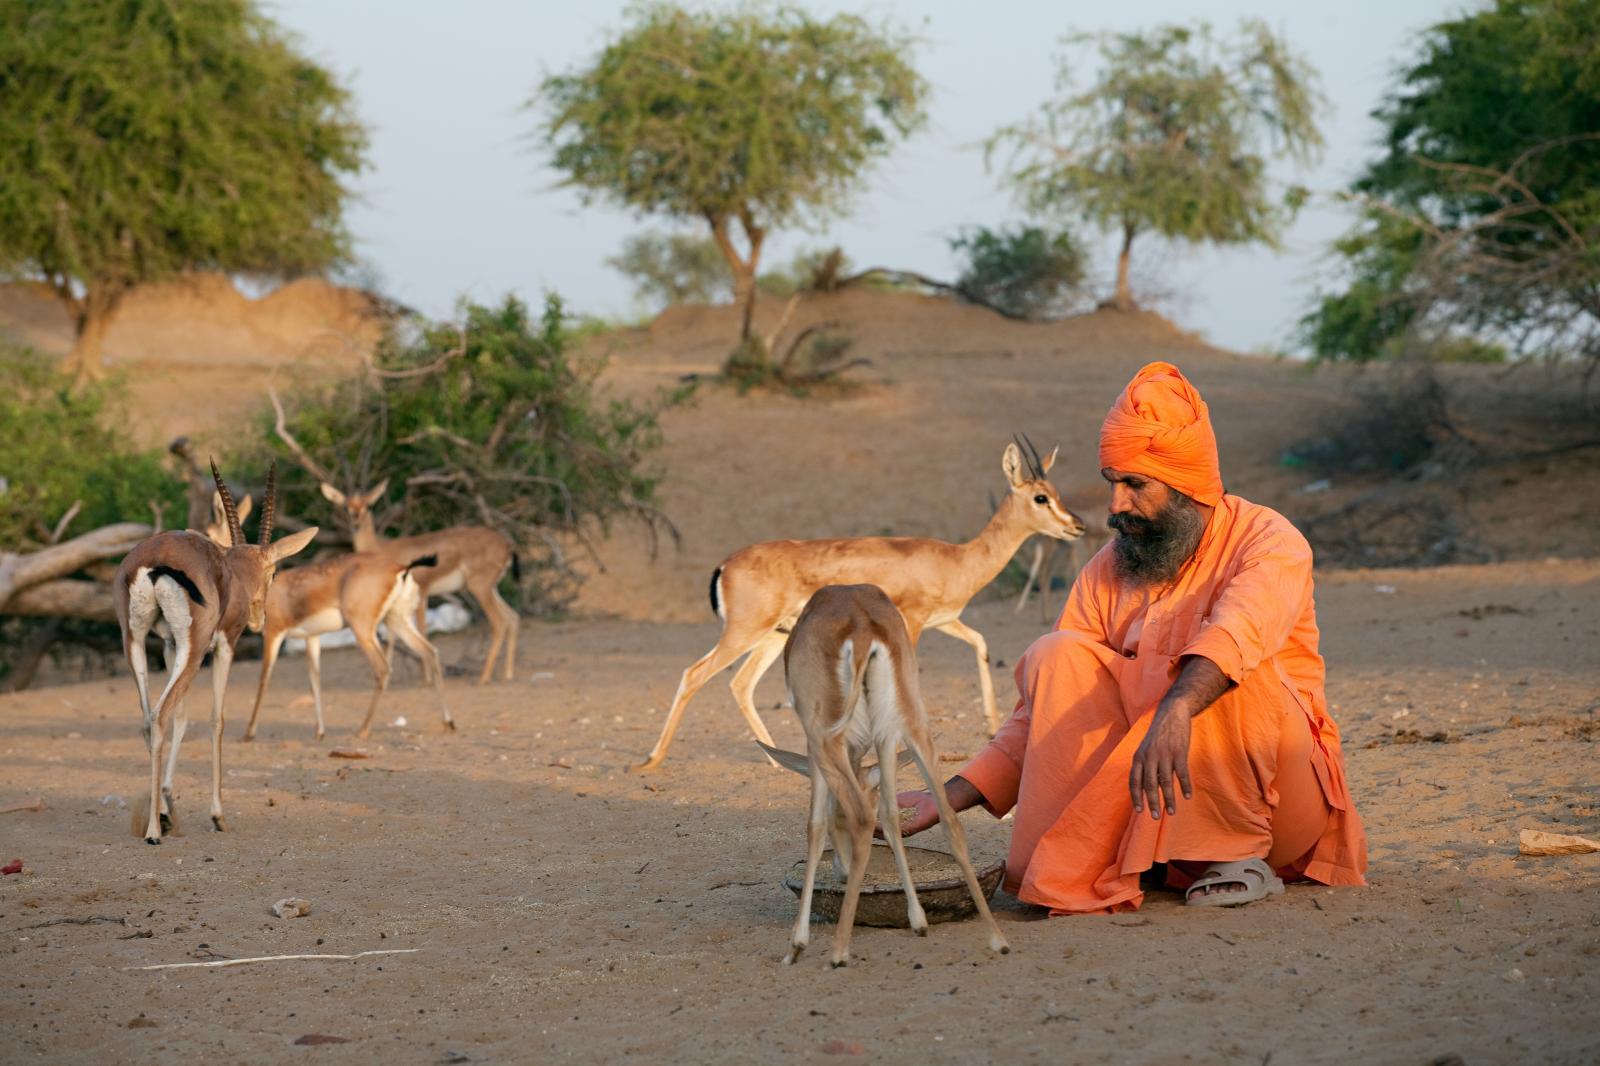 «LesBishnoïs», Prêtre bishnoï nourrissant des gazelles sauvages, Rajasthan, Inde, 2007, 60x90cm.